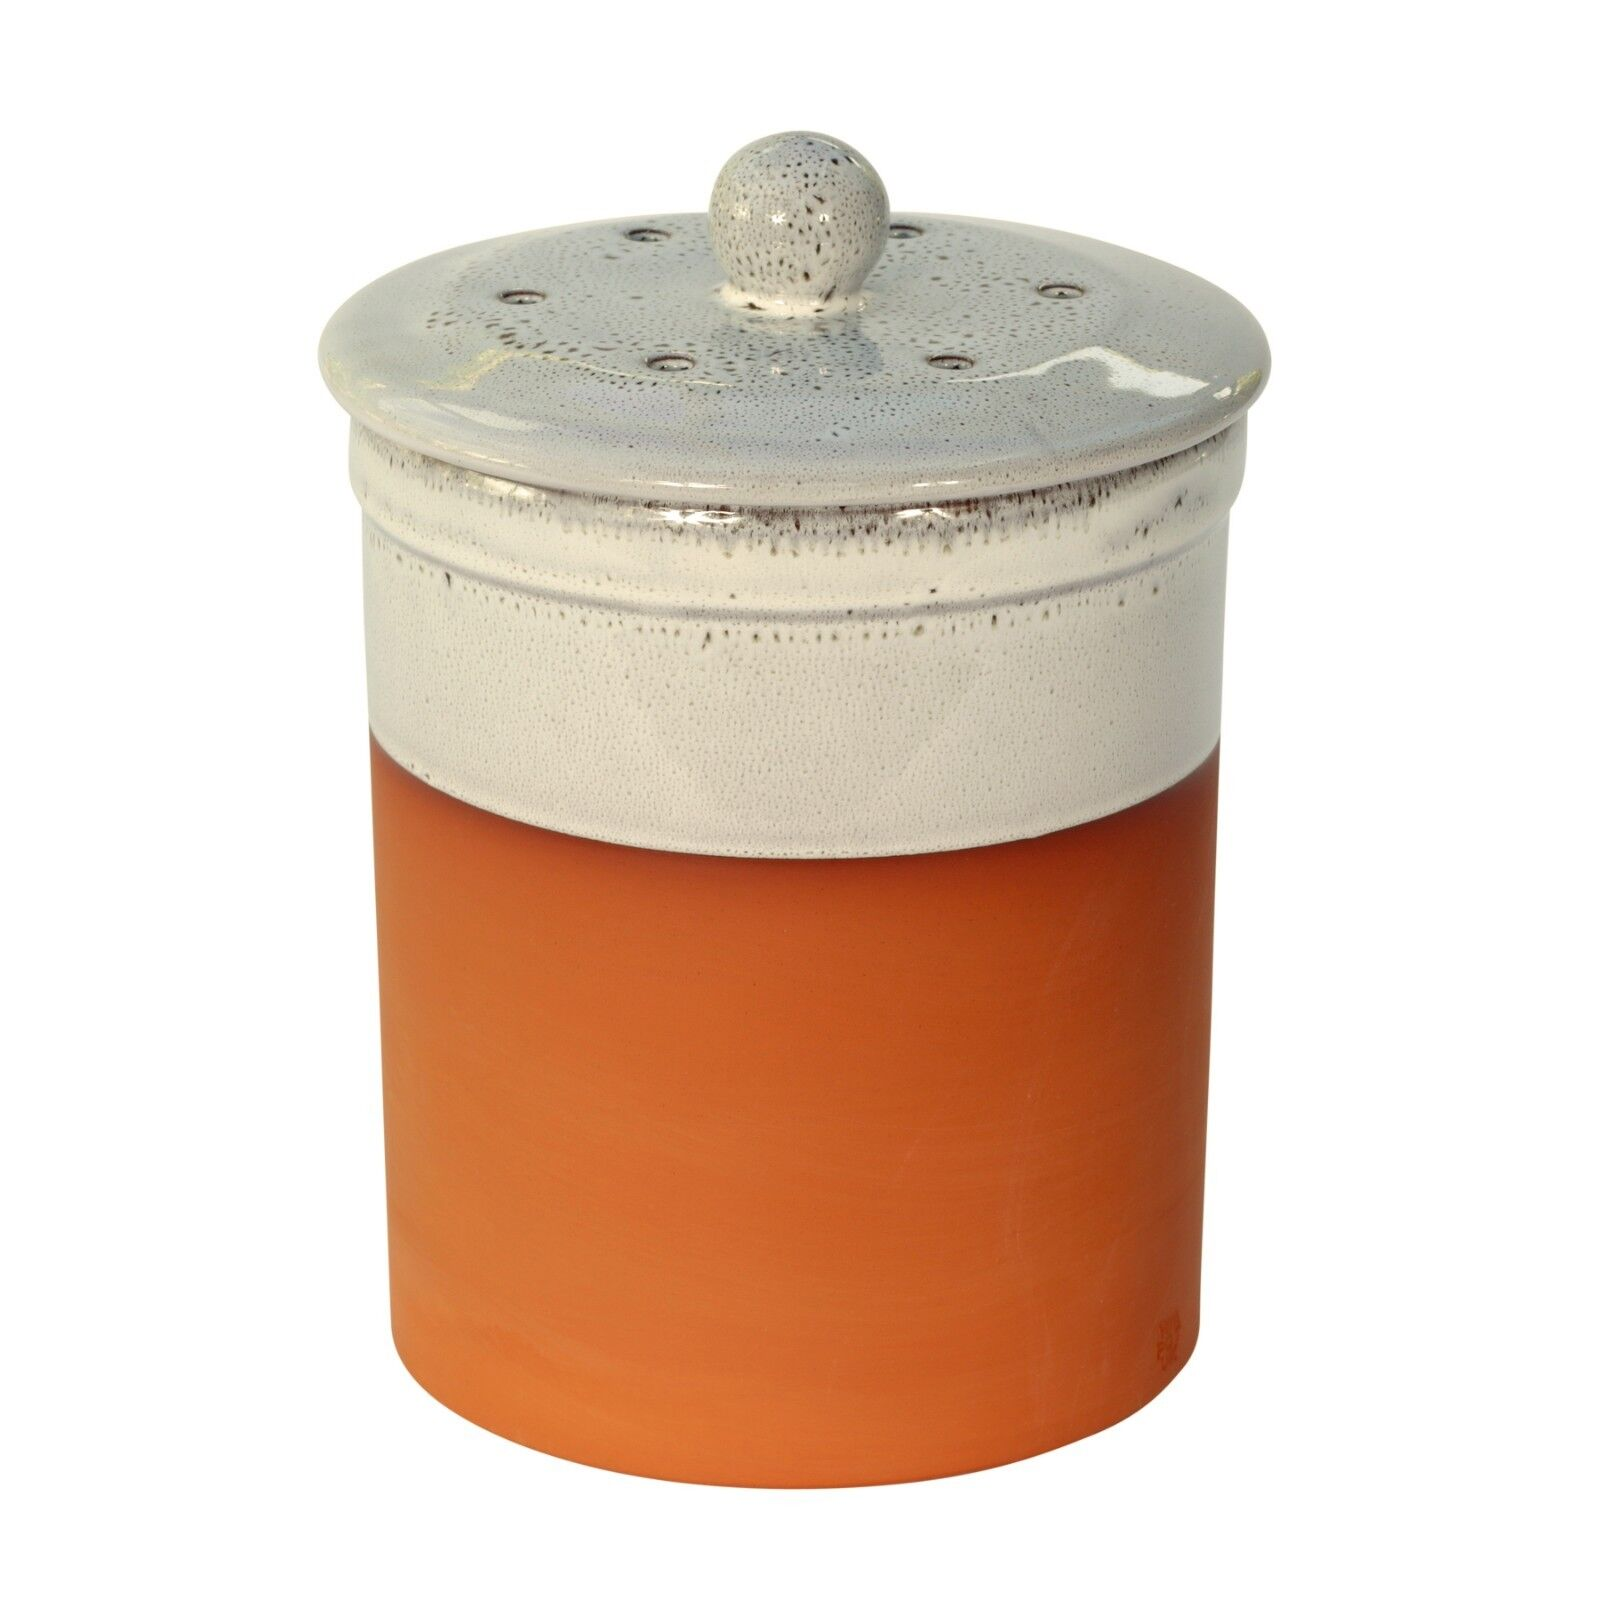 Chetnole Terracotta Compost Caddy - Oyster Weiß - Ceramic Kitchen Compost Bin